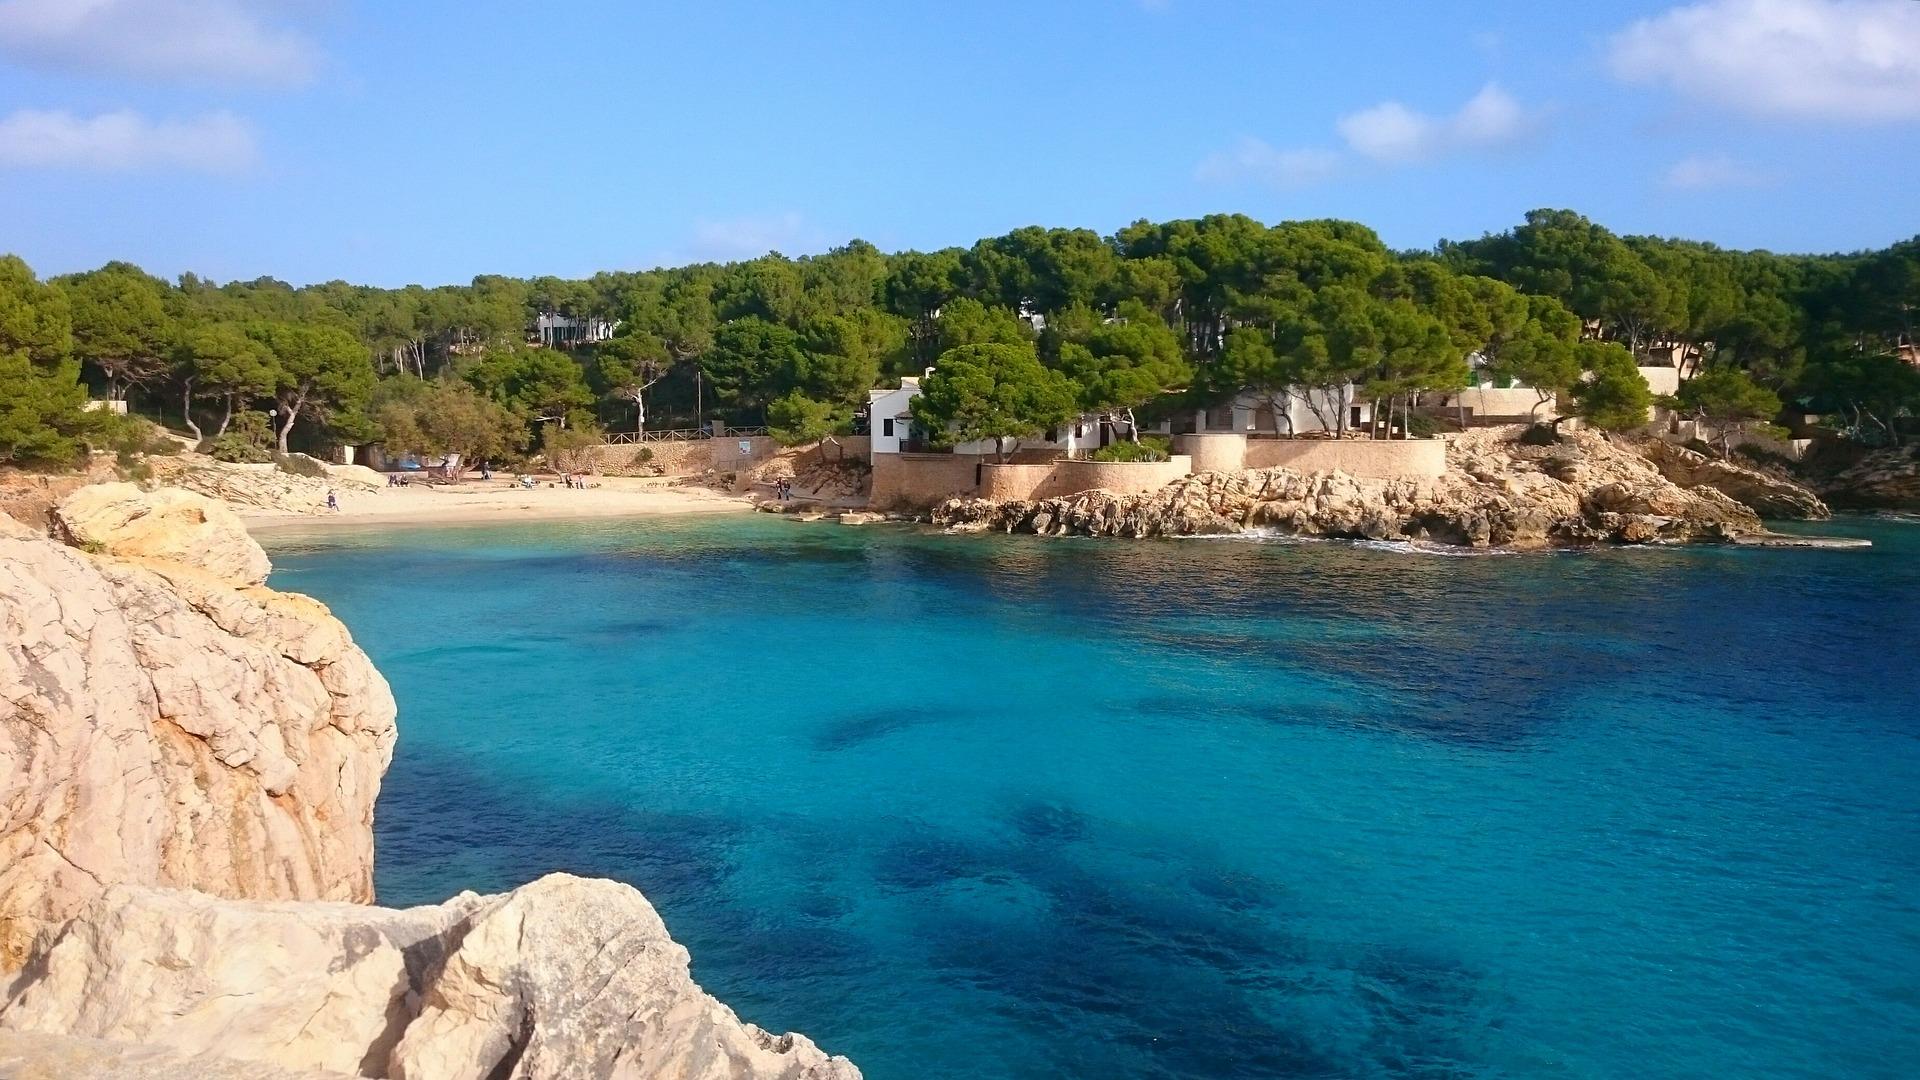 R2 Bahia Cala Ratjada - Pauschalreise mit Halbpension ab 264,00€